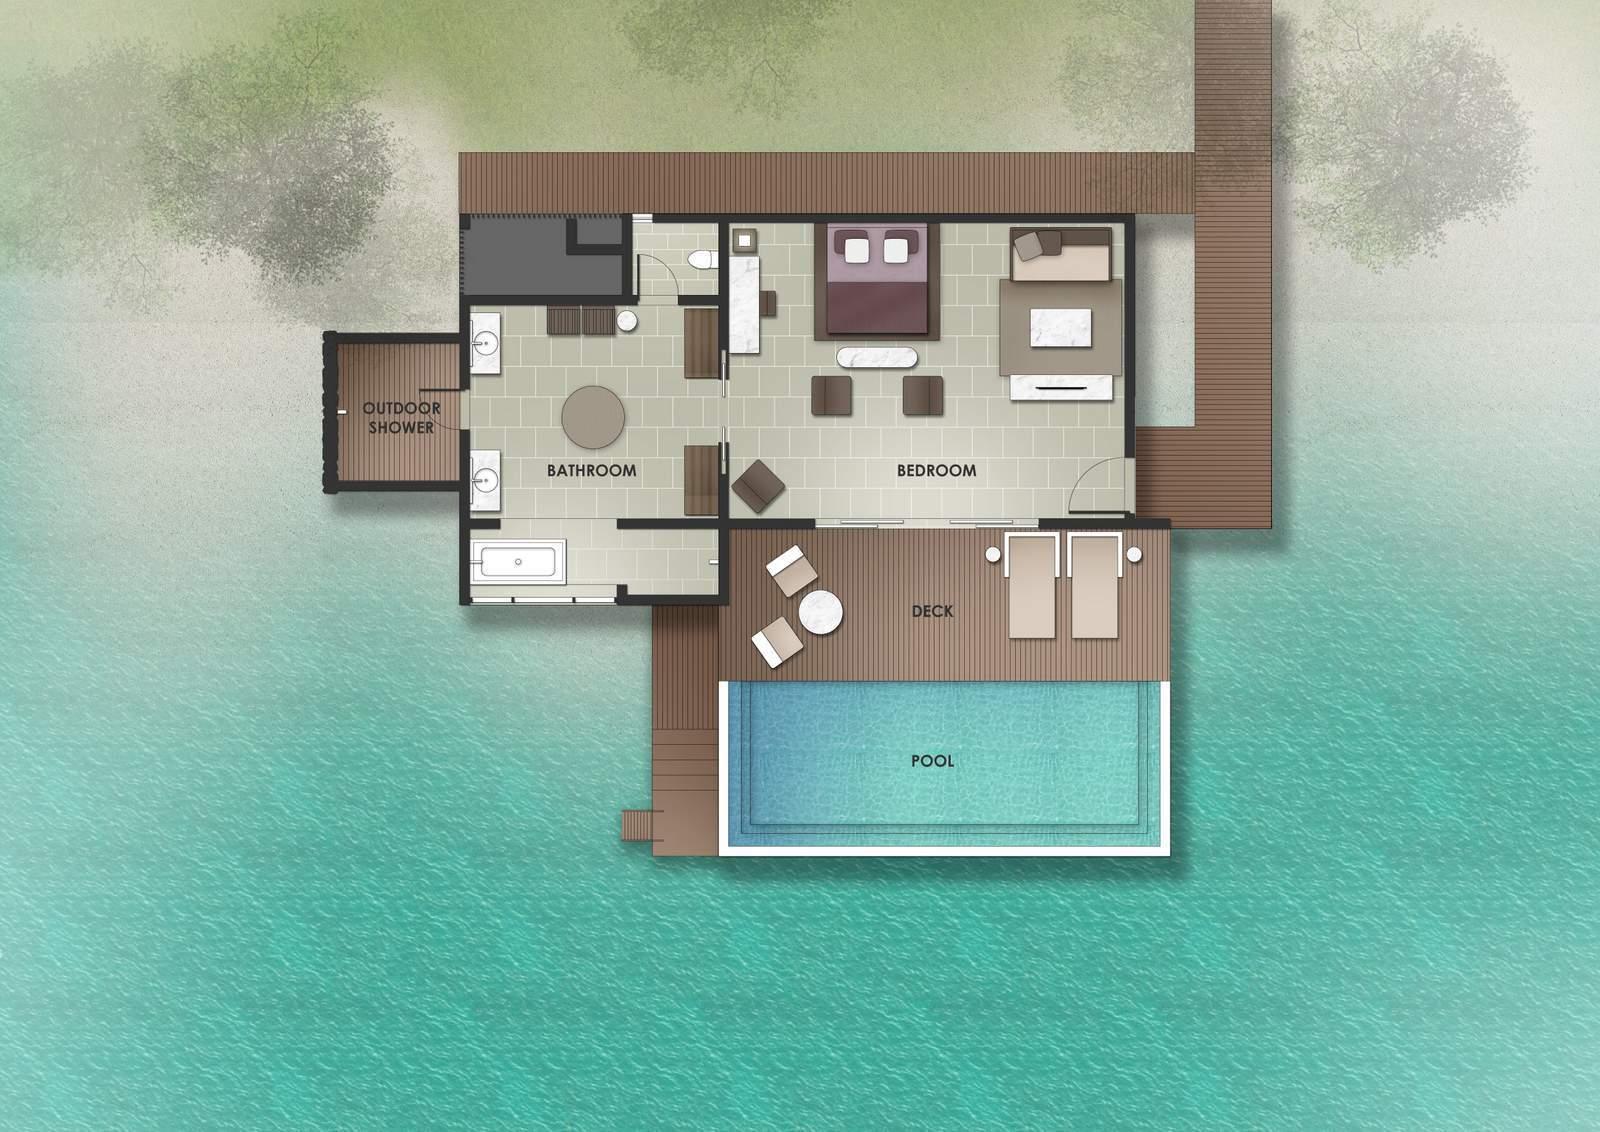 Мальдивы, отель The Residence Maldives at Dhigurah, план-схема номера Deluxe Lagoon Pool Villa